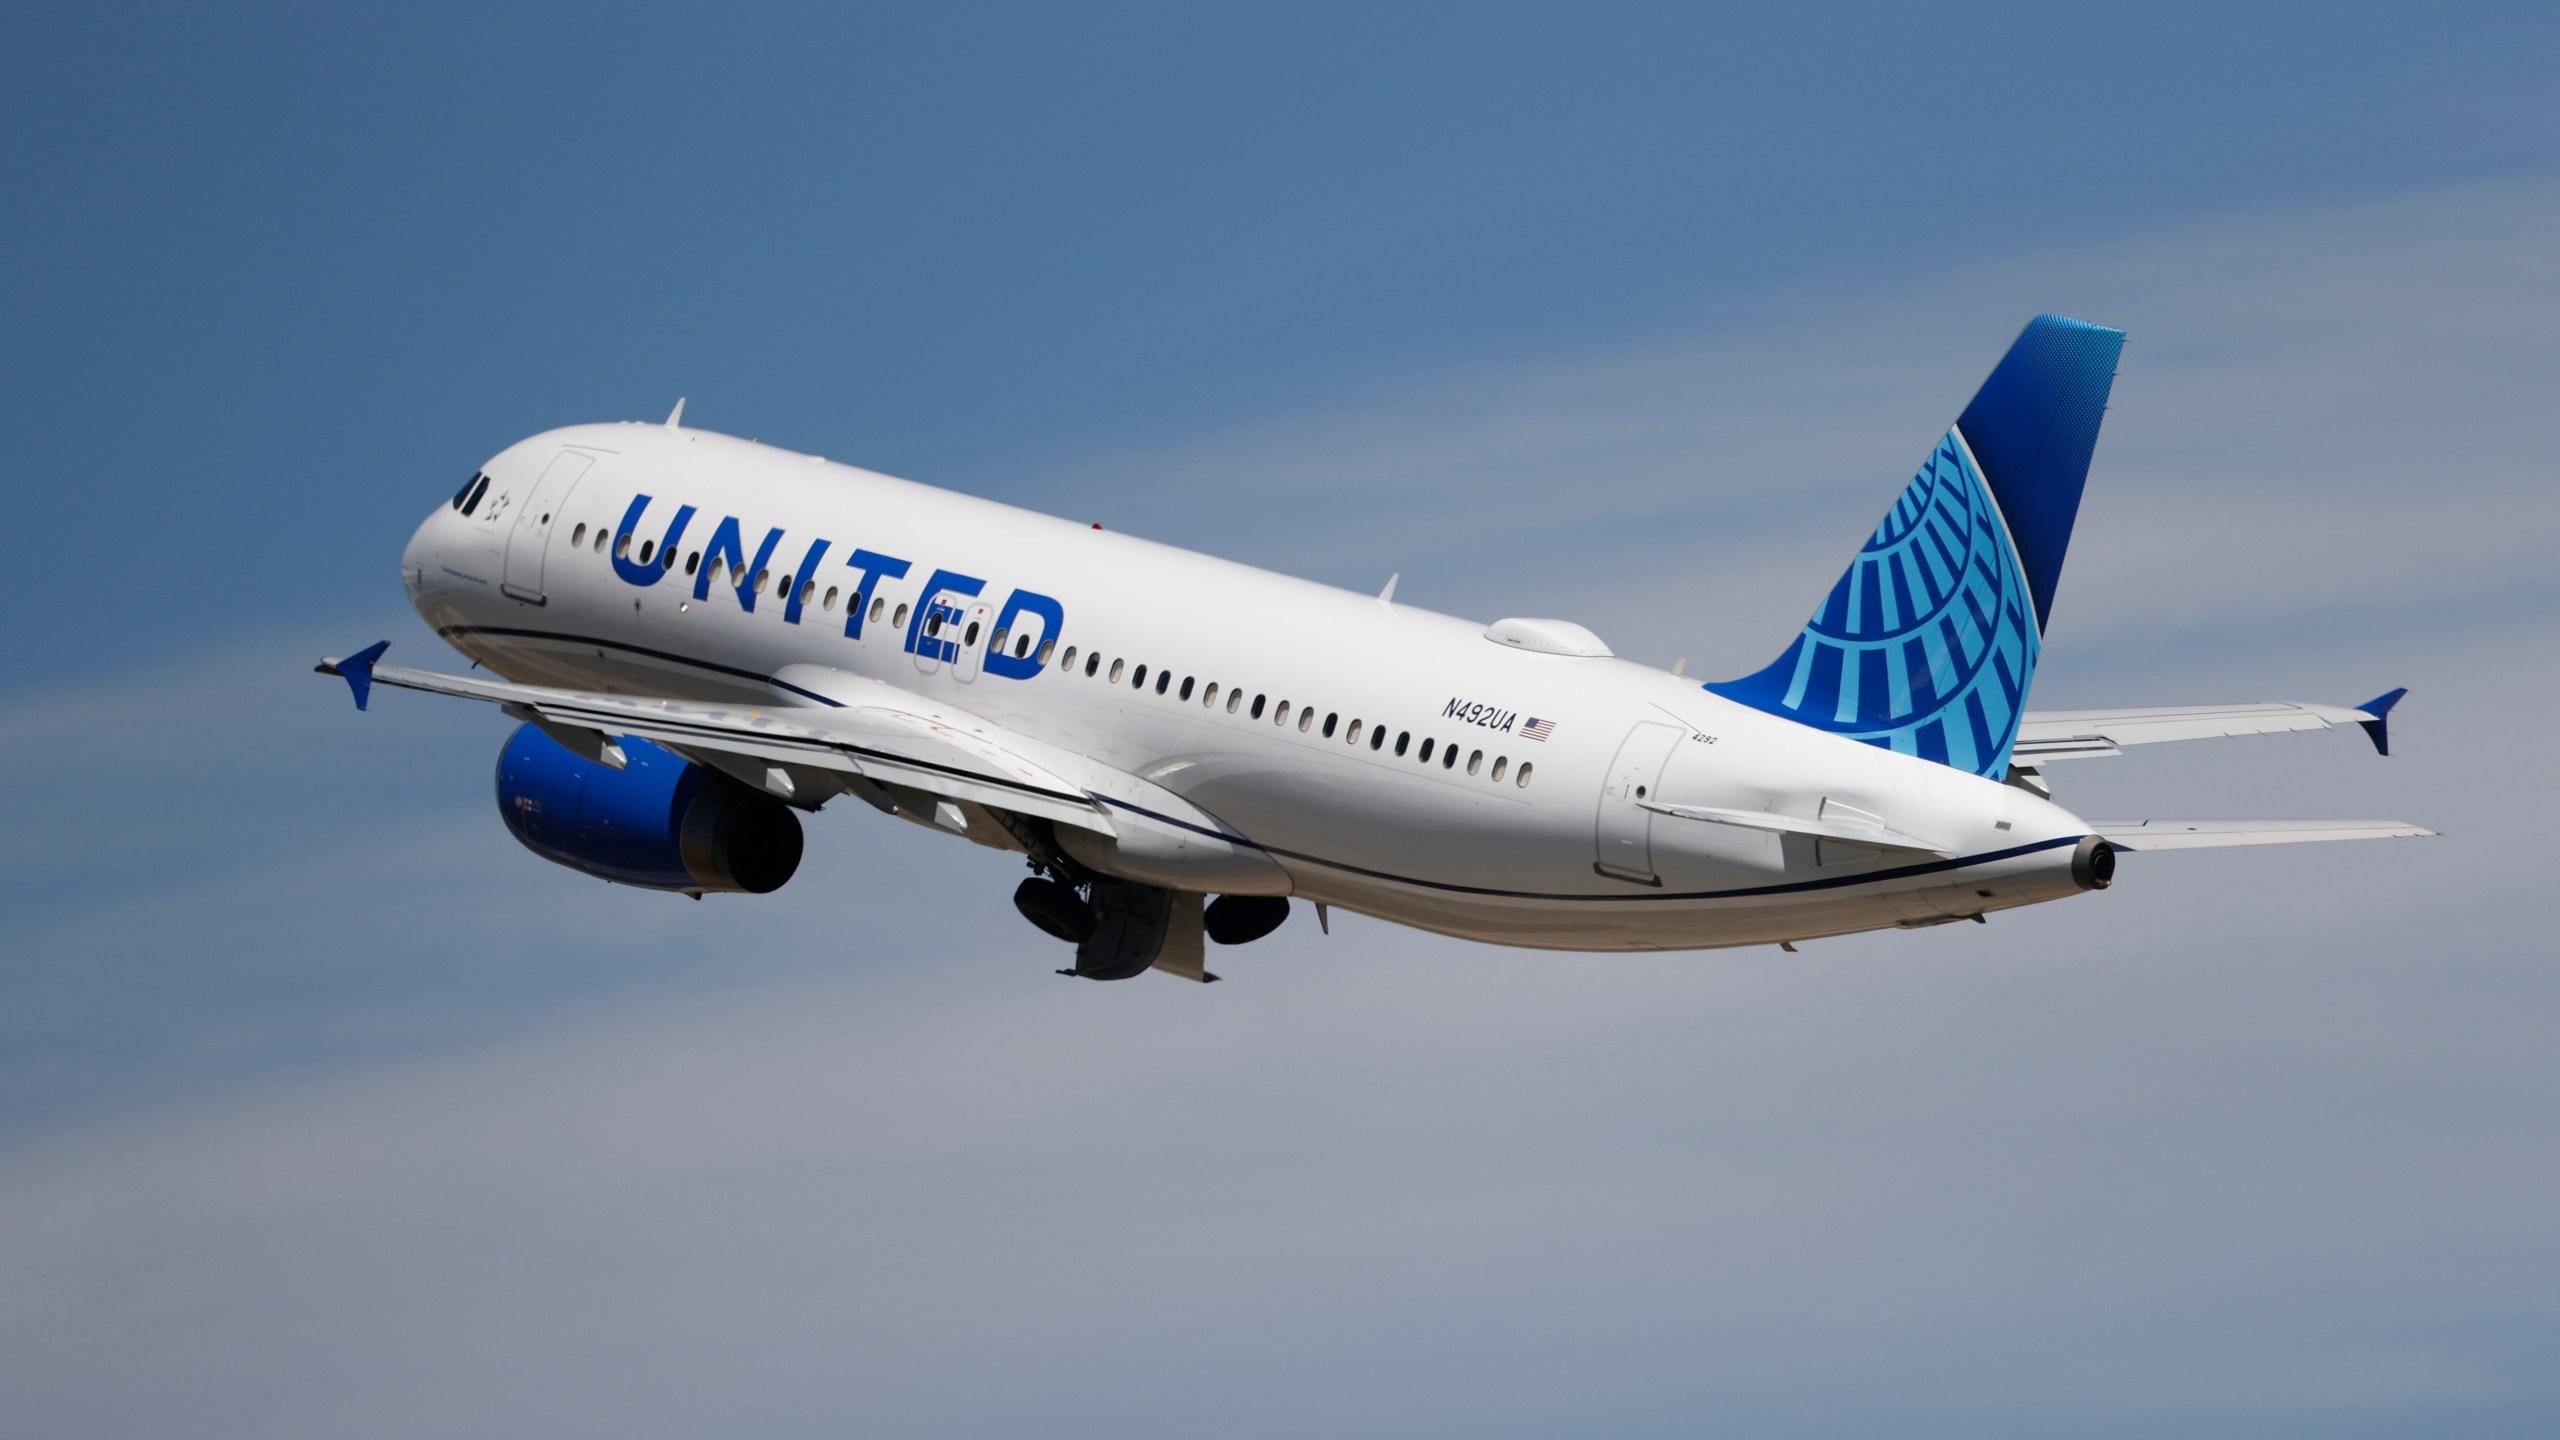 denver international airport, united airlines